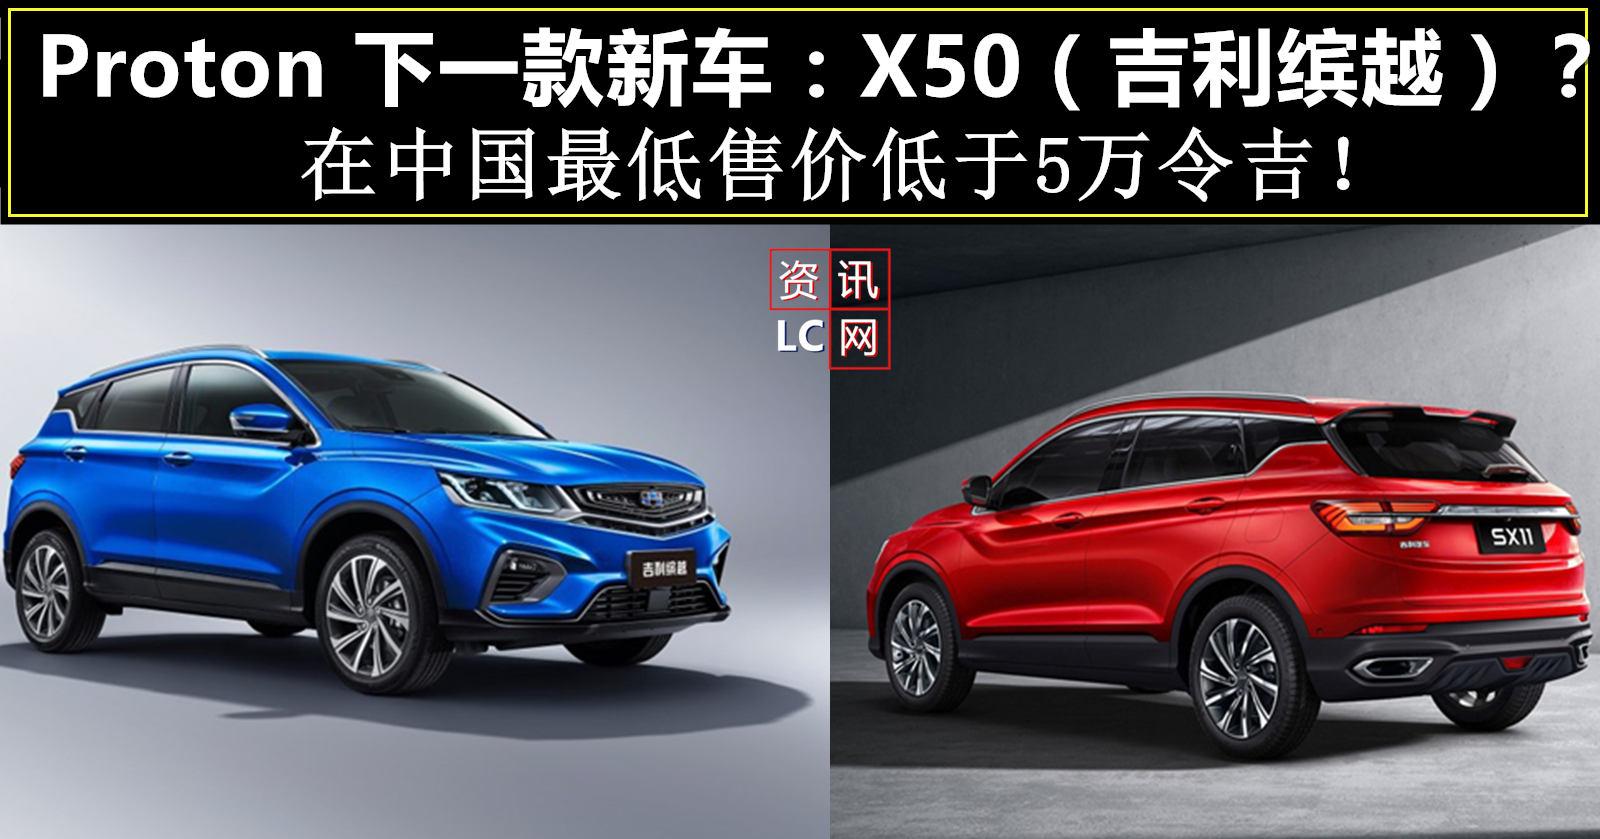 Proton X50: Proton 下一款新车:缤越 X50 ?